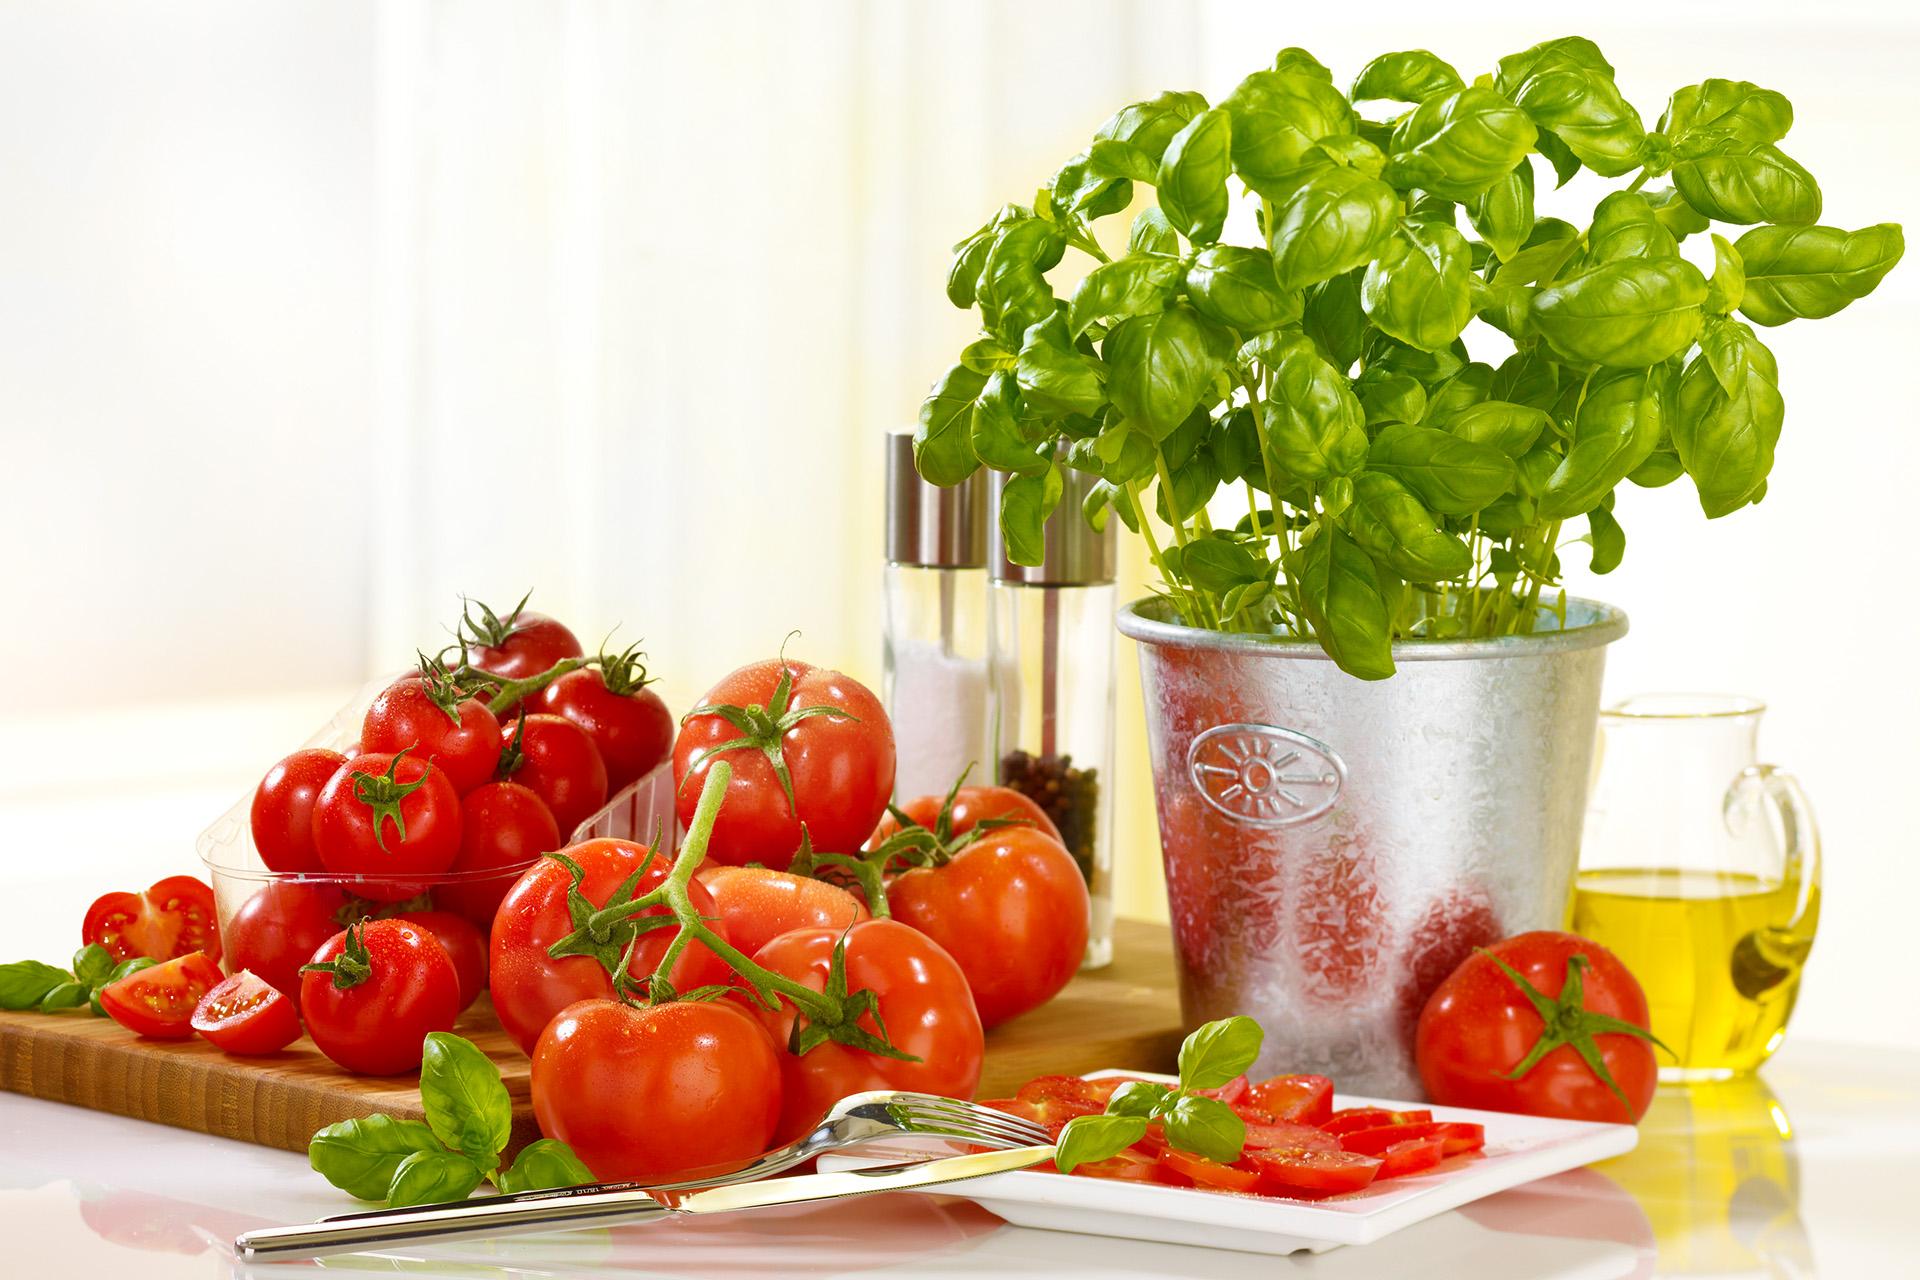 Fotodesign-matthias-schütz-tomaten-basilikum-1920pix